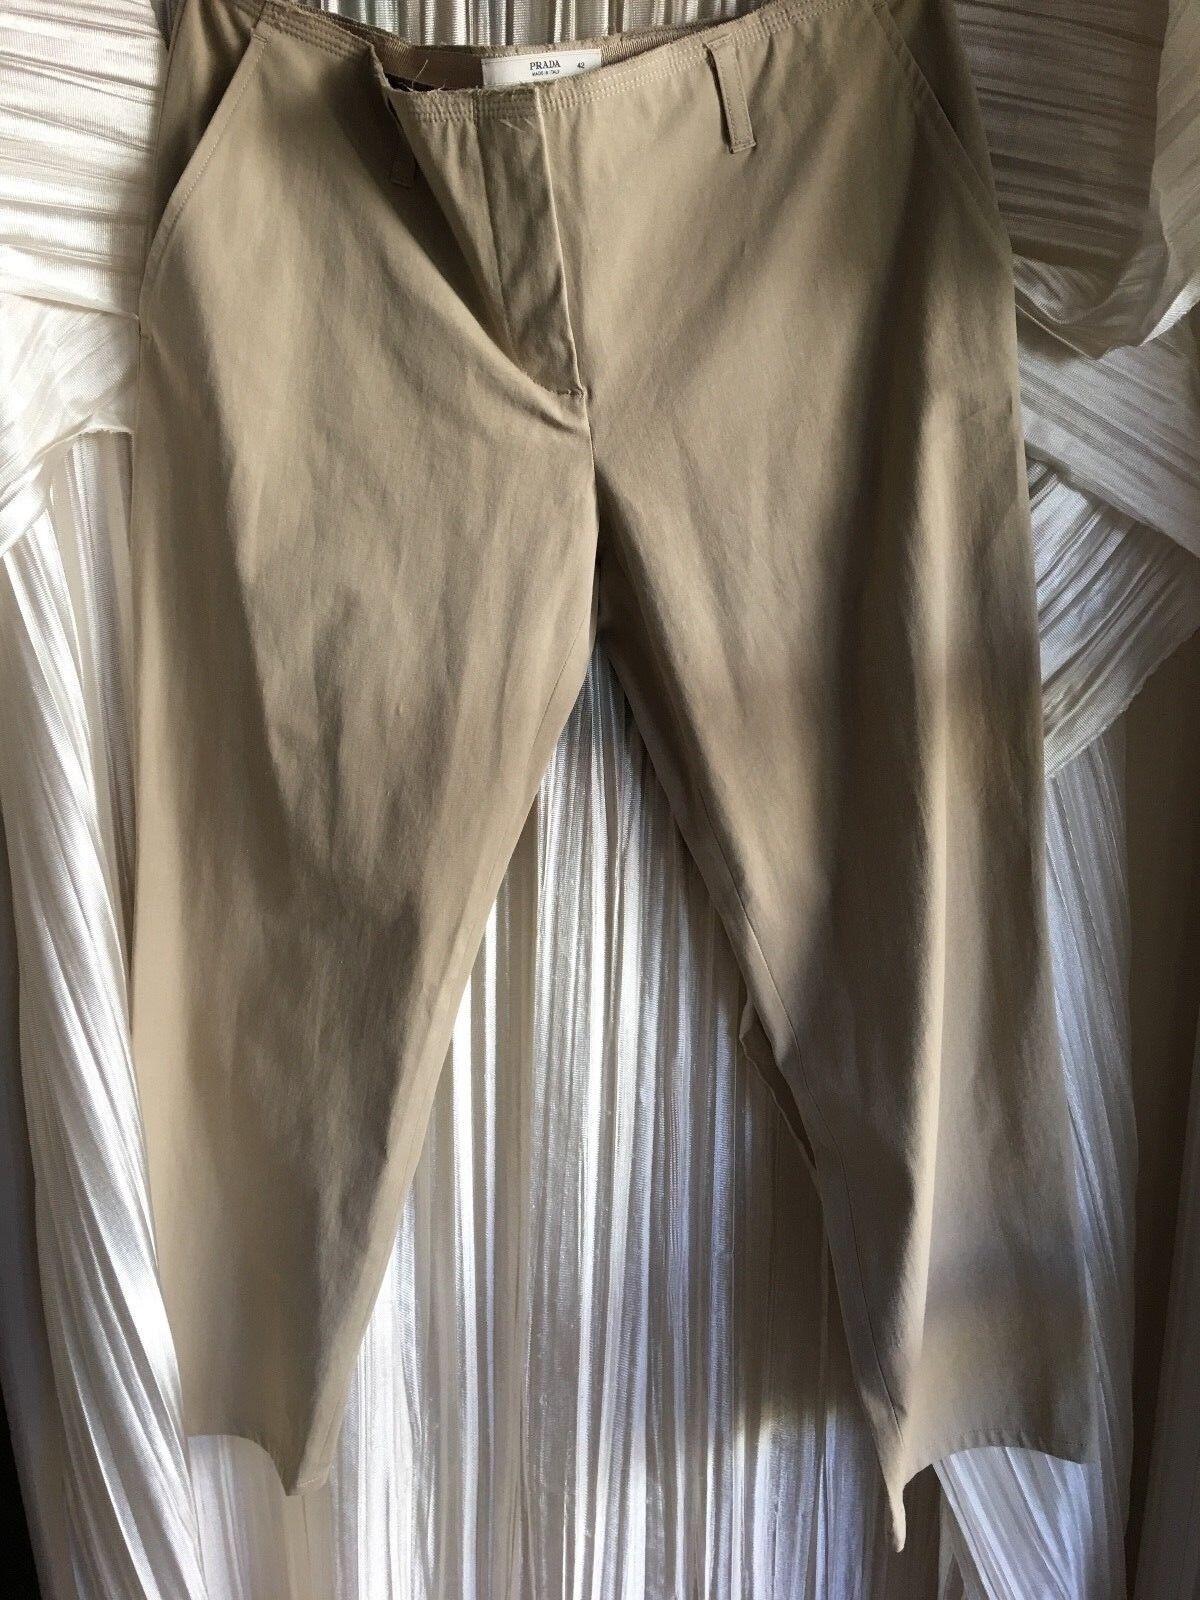 Prada size 42 khaki tan front zip cotton & elastane deconstructed waist